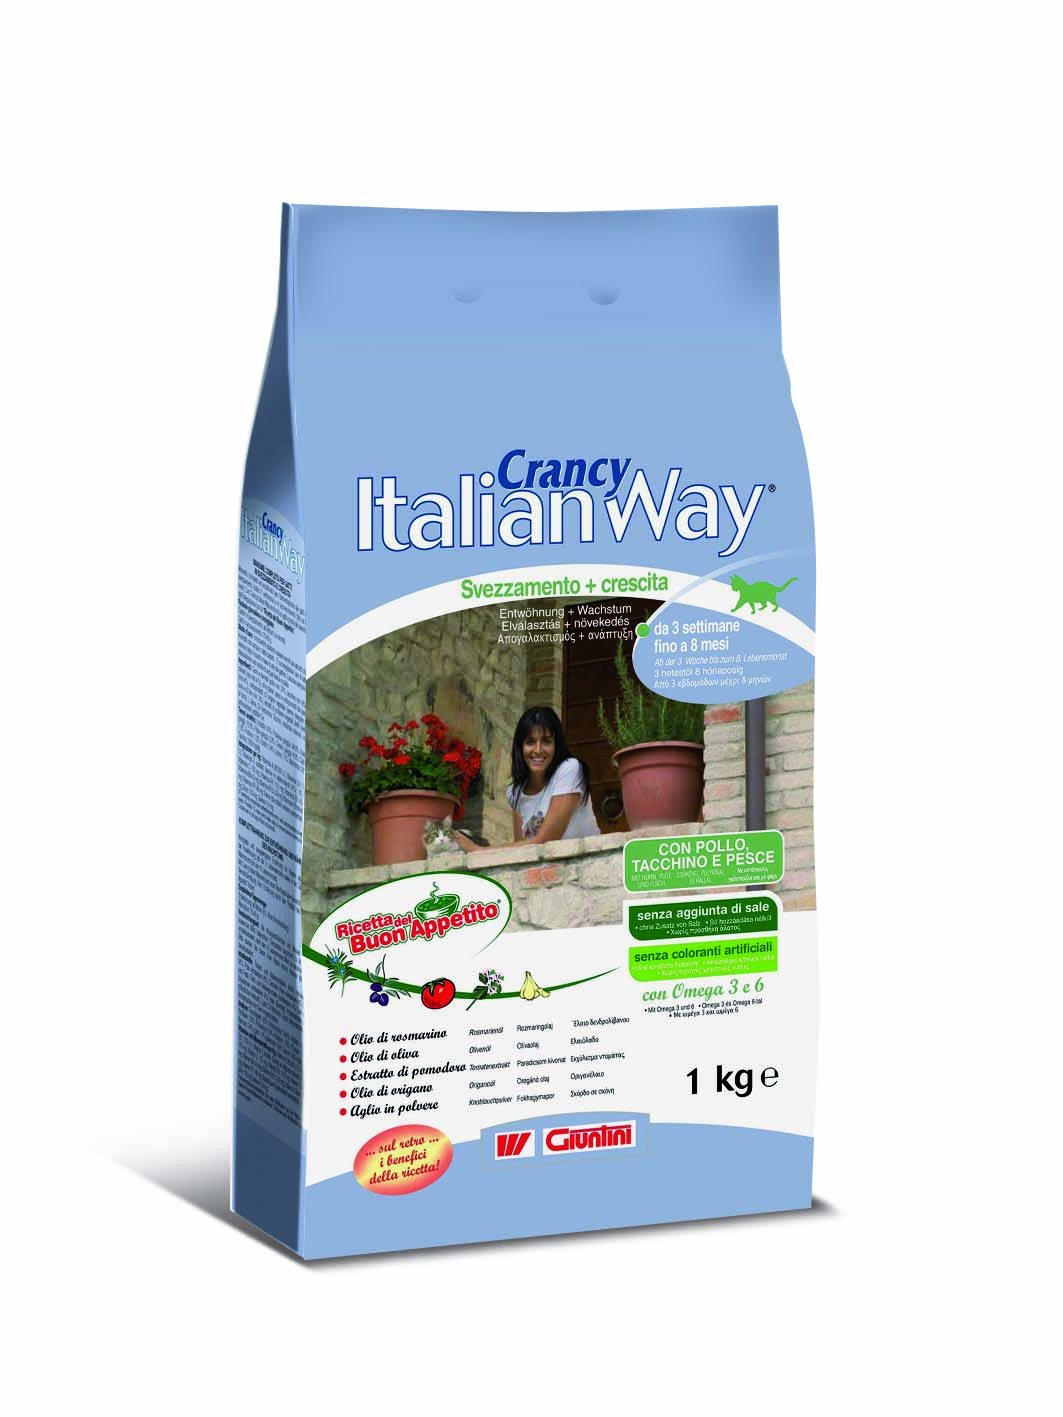 GIUNTINI - CONAGIT - Crancy Italian Way